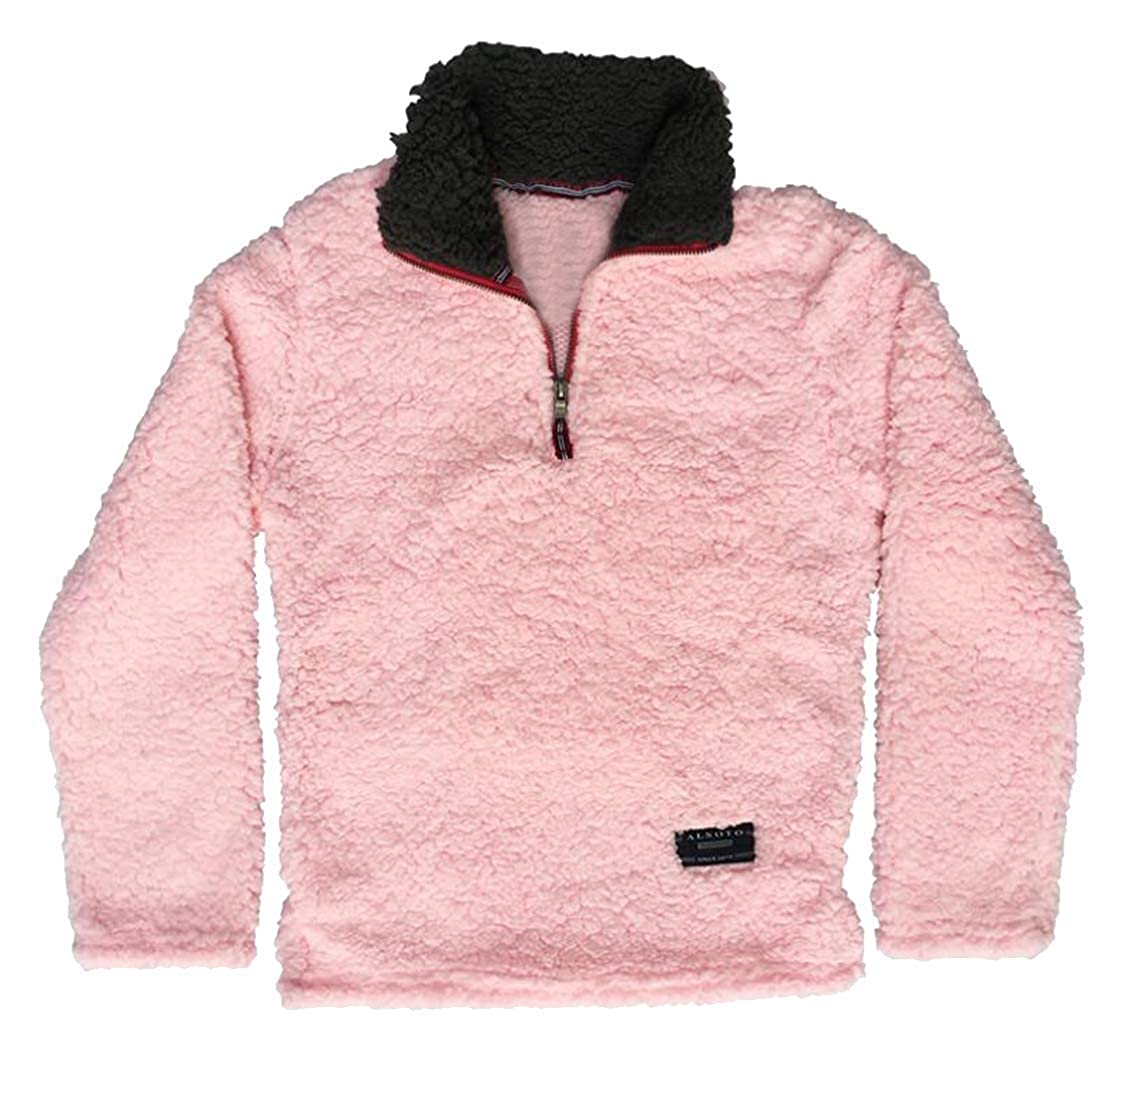 Hadudu Womens Zipper Faux Lambwool Long Sleeve Plus Size Pullover Sweatshirt Top Blouse